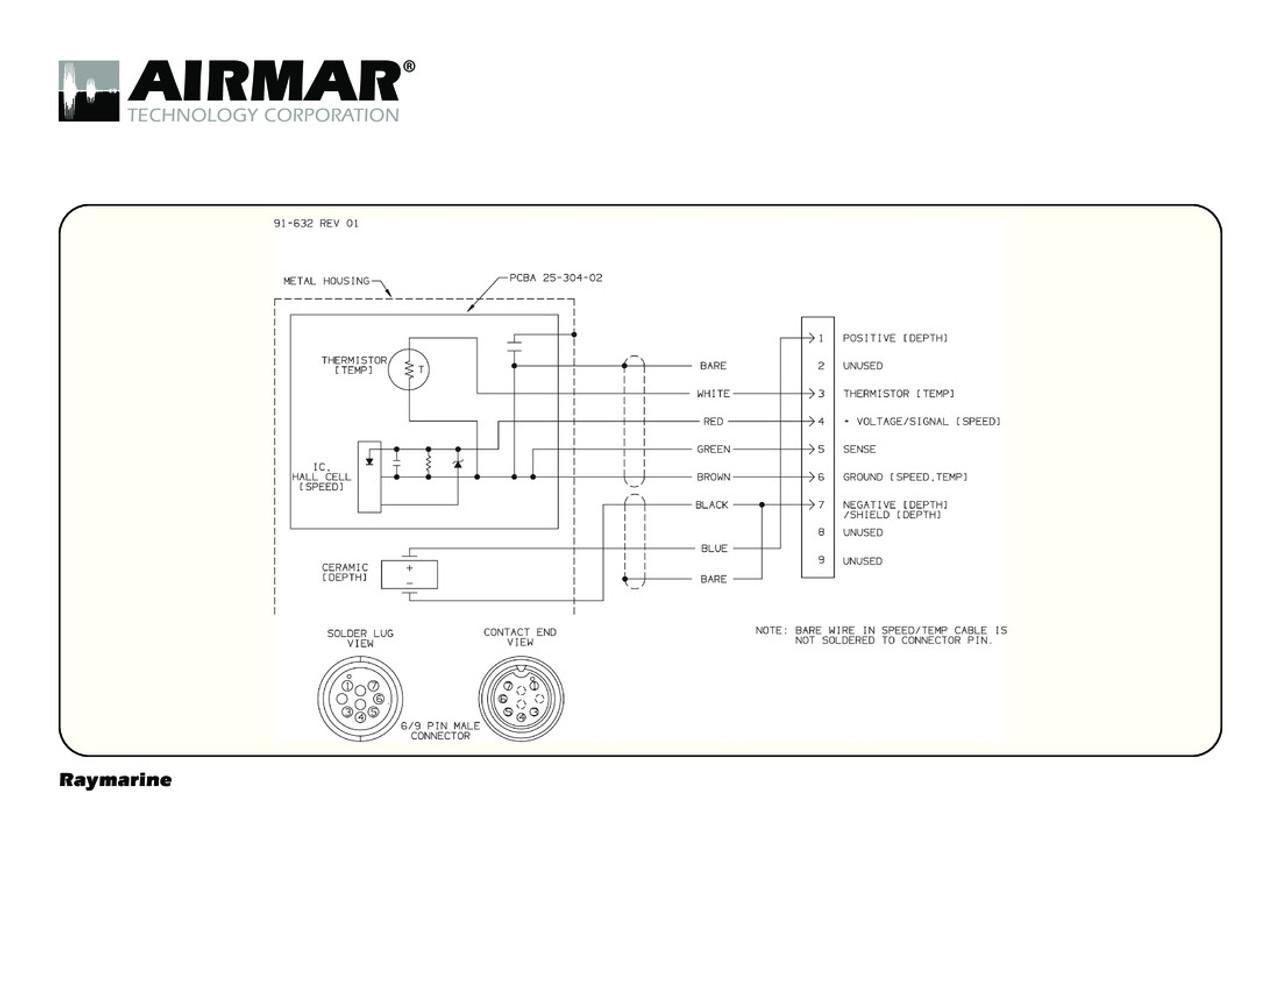 airmar wiring diagram raymarine a series 9 pin blue bottle marine Panasonic Wiring Diagrams depth, speed \u0026 temperature transducers for raymarine a series with raymarine 9 pin